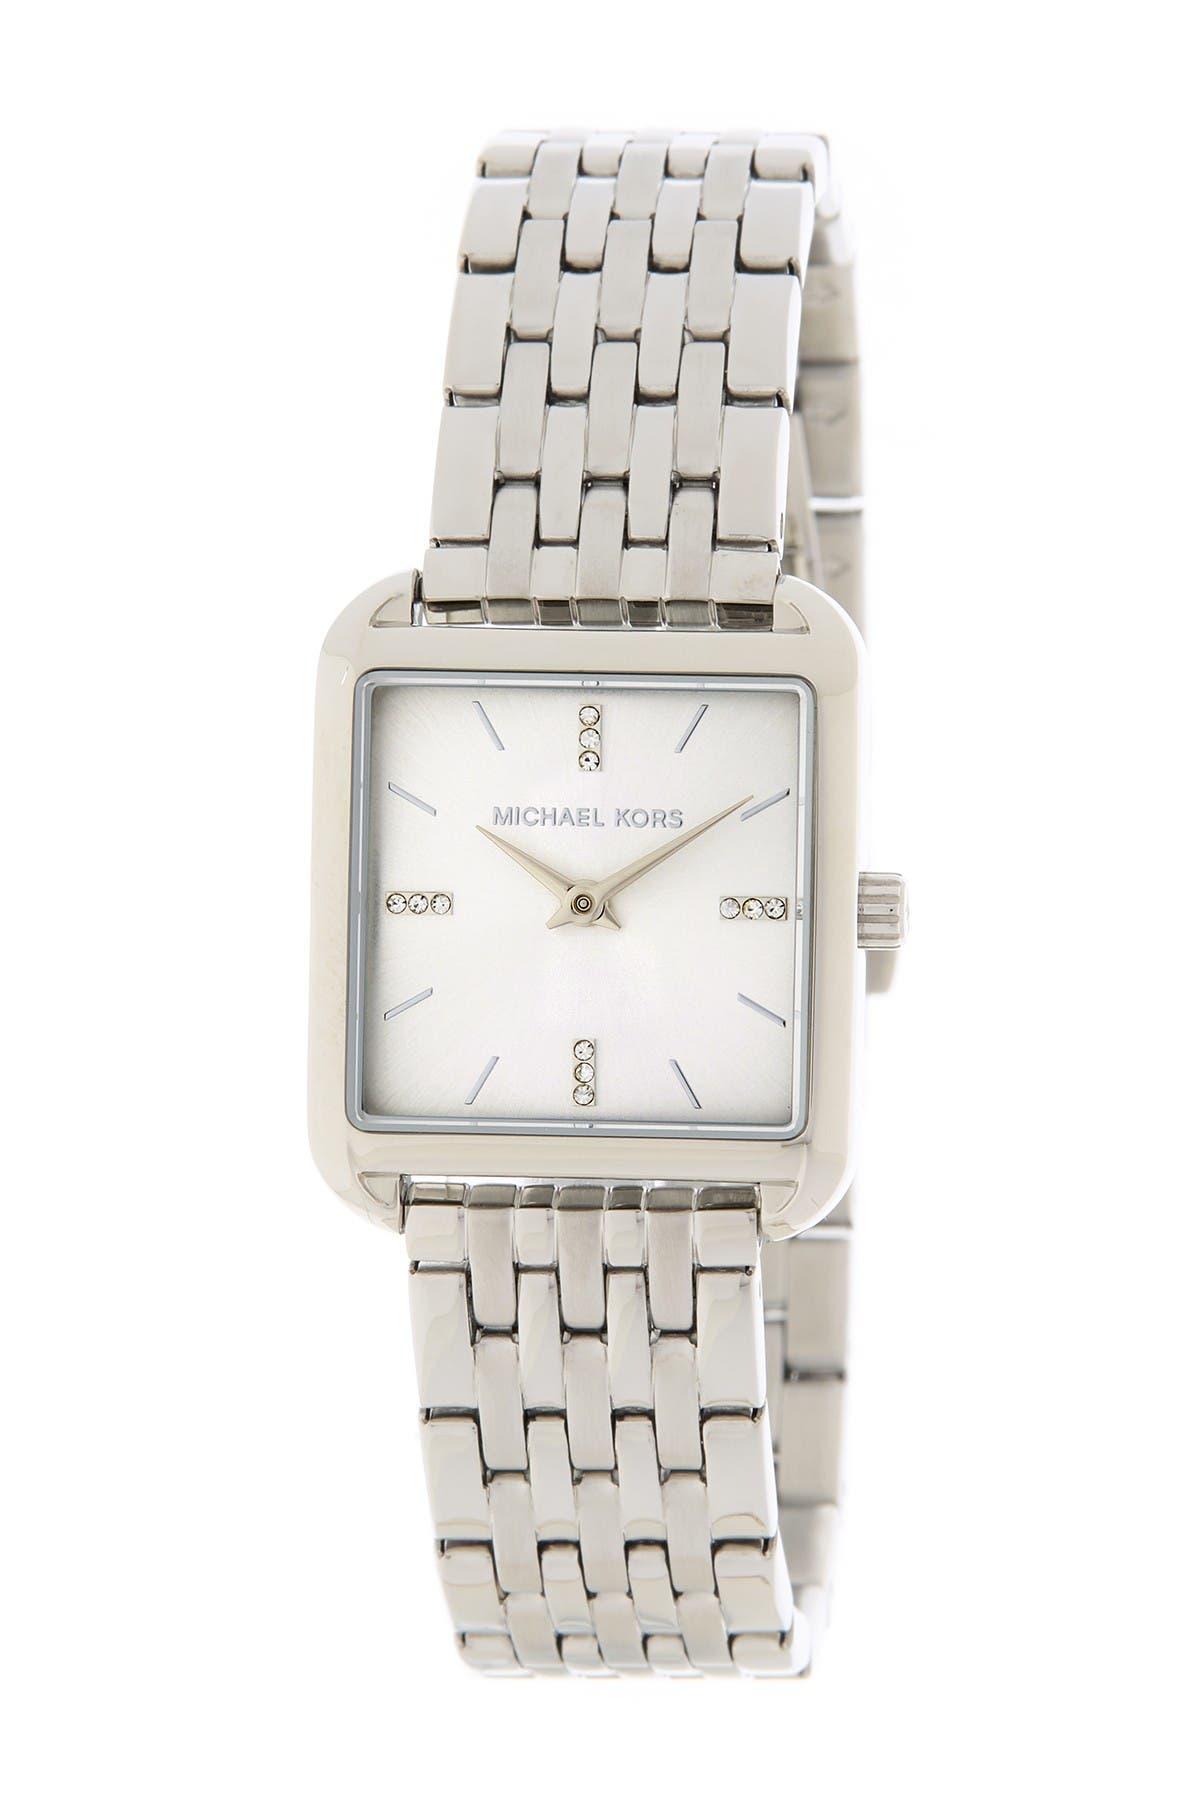 Image of MICHAEL Michael Kors Women's Drew Stainless Steel Bracelet Watch, 33mm x 39mm